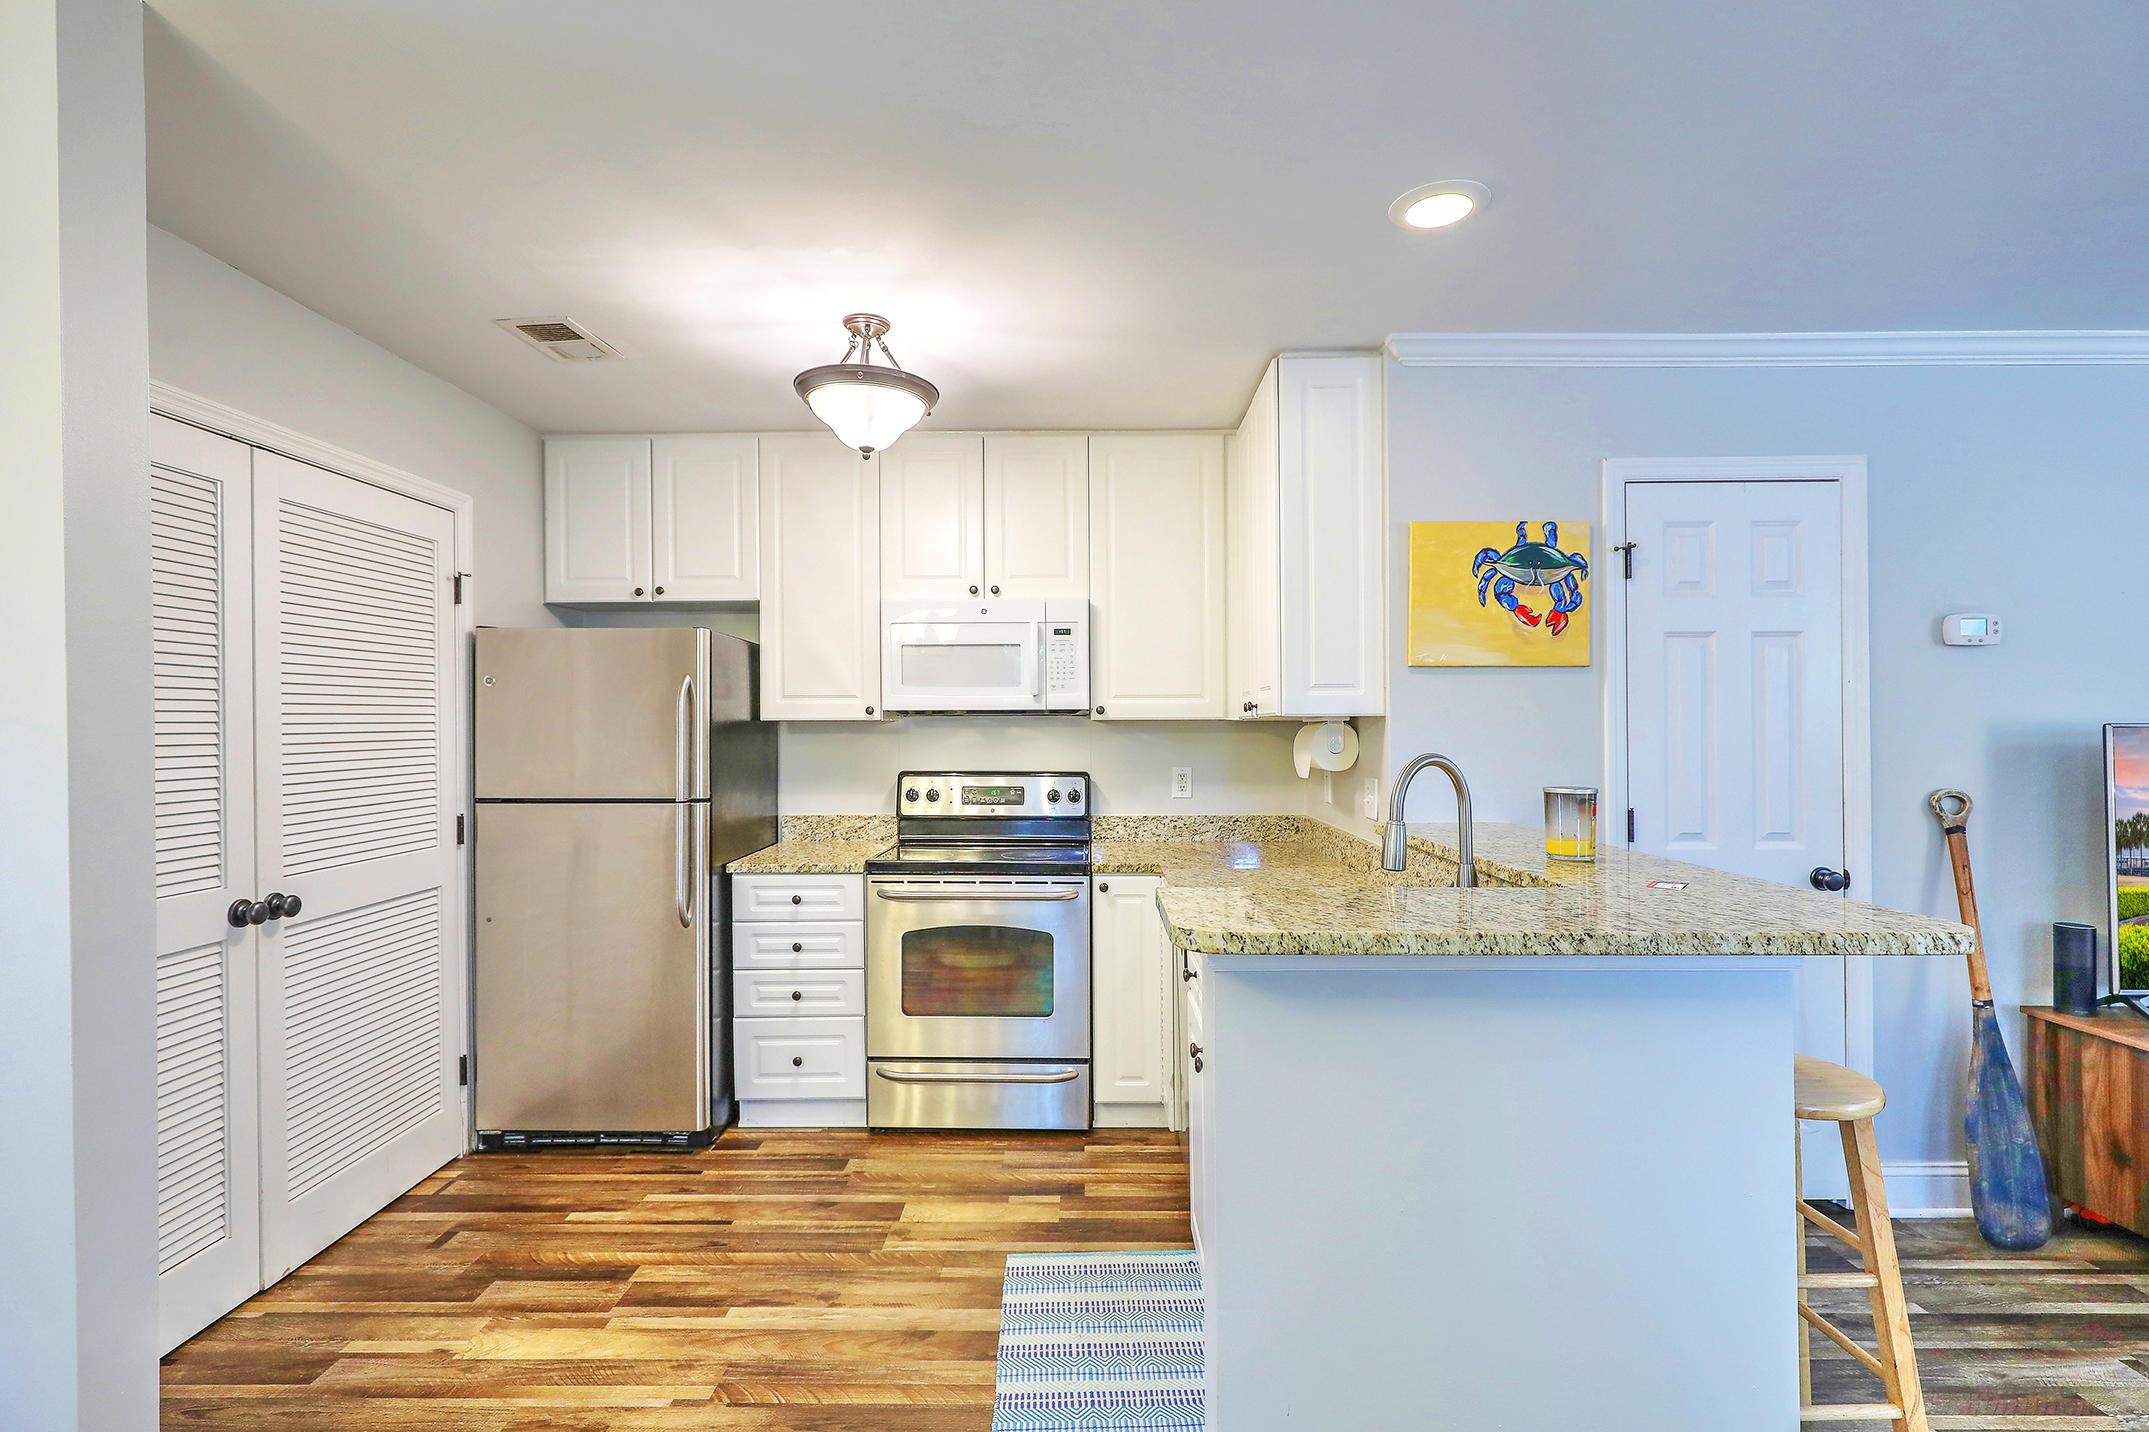 Remington Forest Homes For Sale - 1366 Cassidy, Mount Pleasant, SC - 8